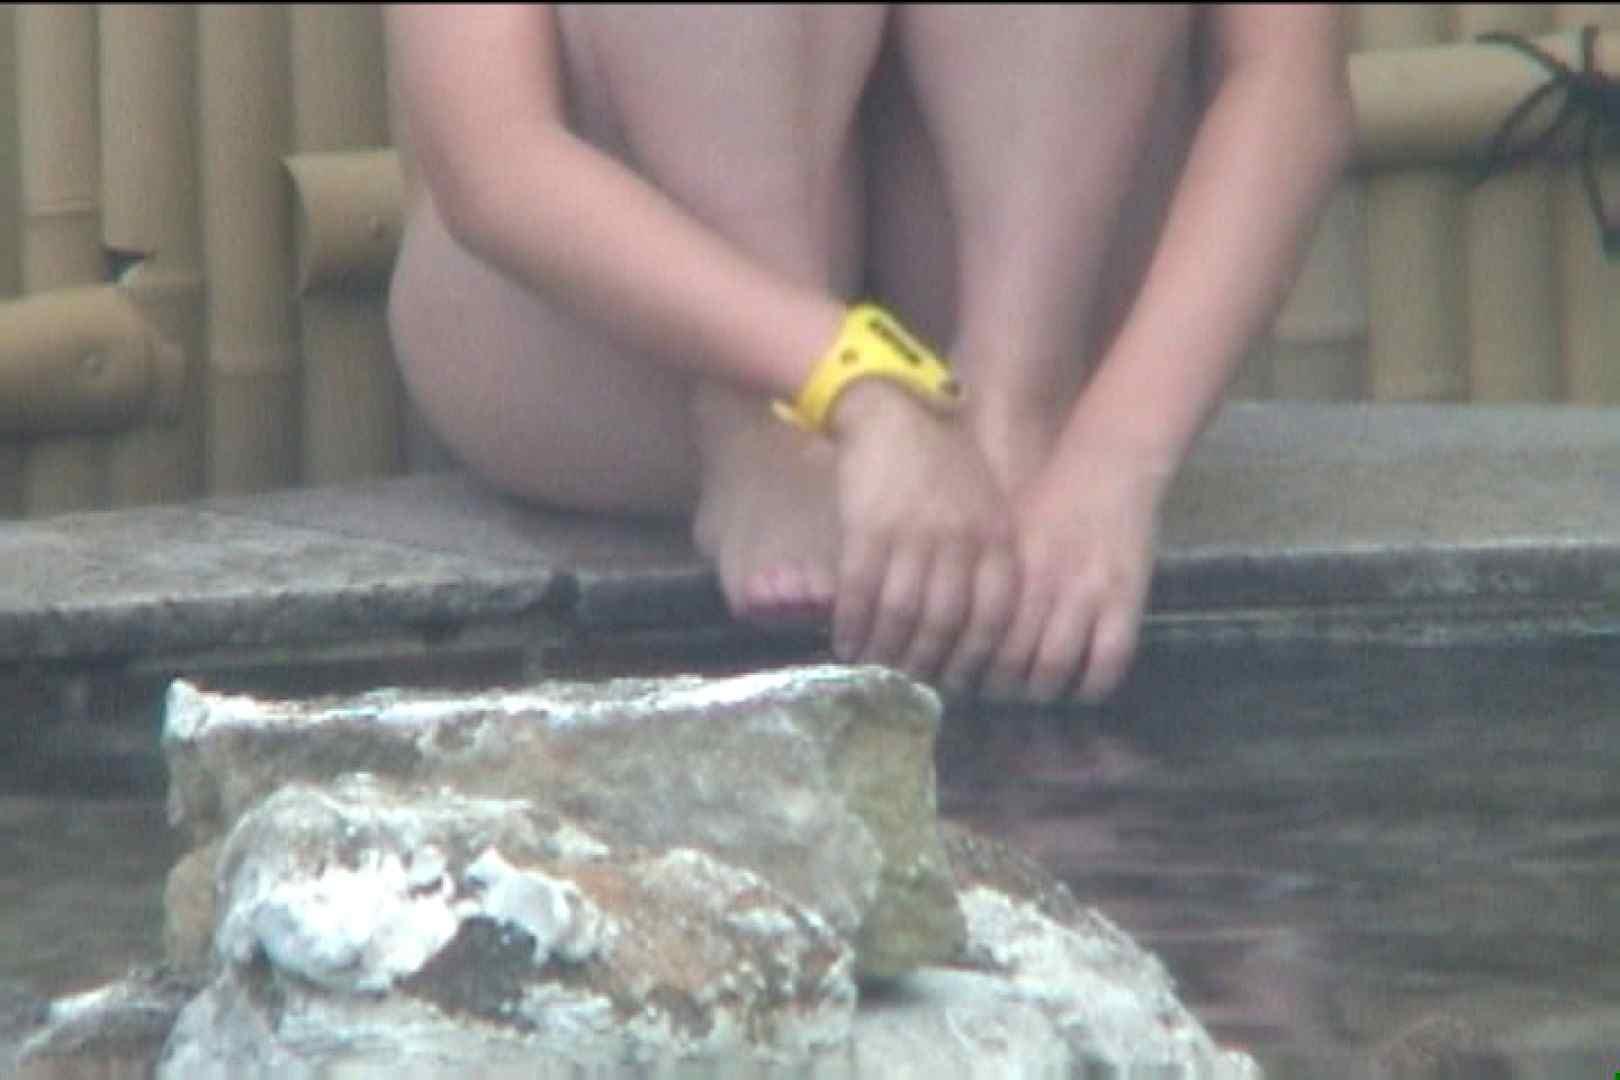 Aquaな露天風呂Vol.99【VIP限定】 女体盗撮 盗み撮りオマンコ動画キャプチャ 59連発 50